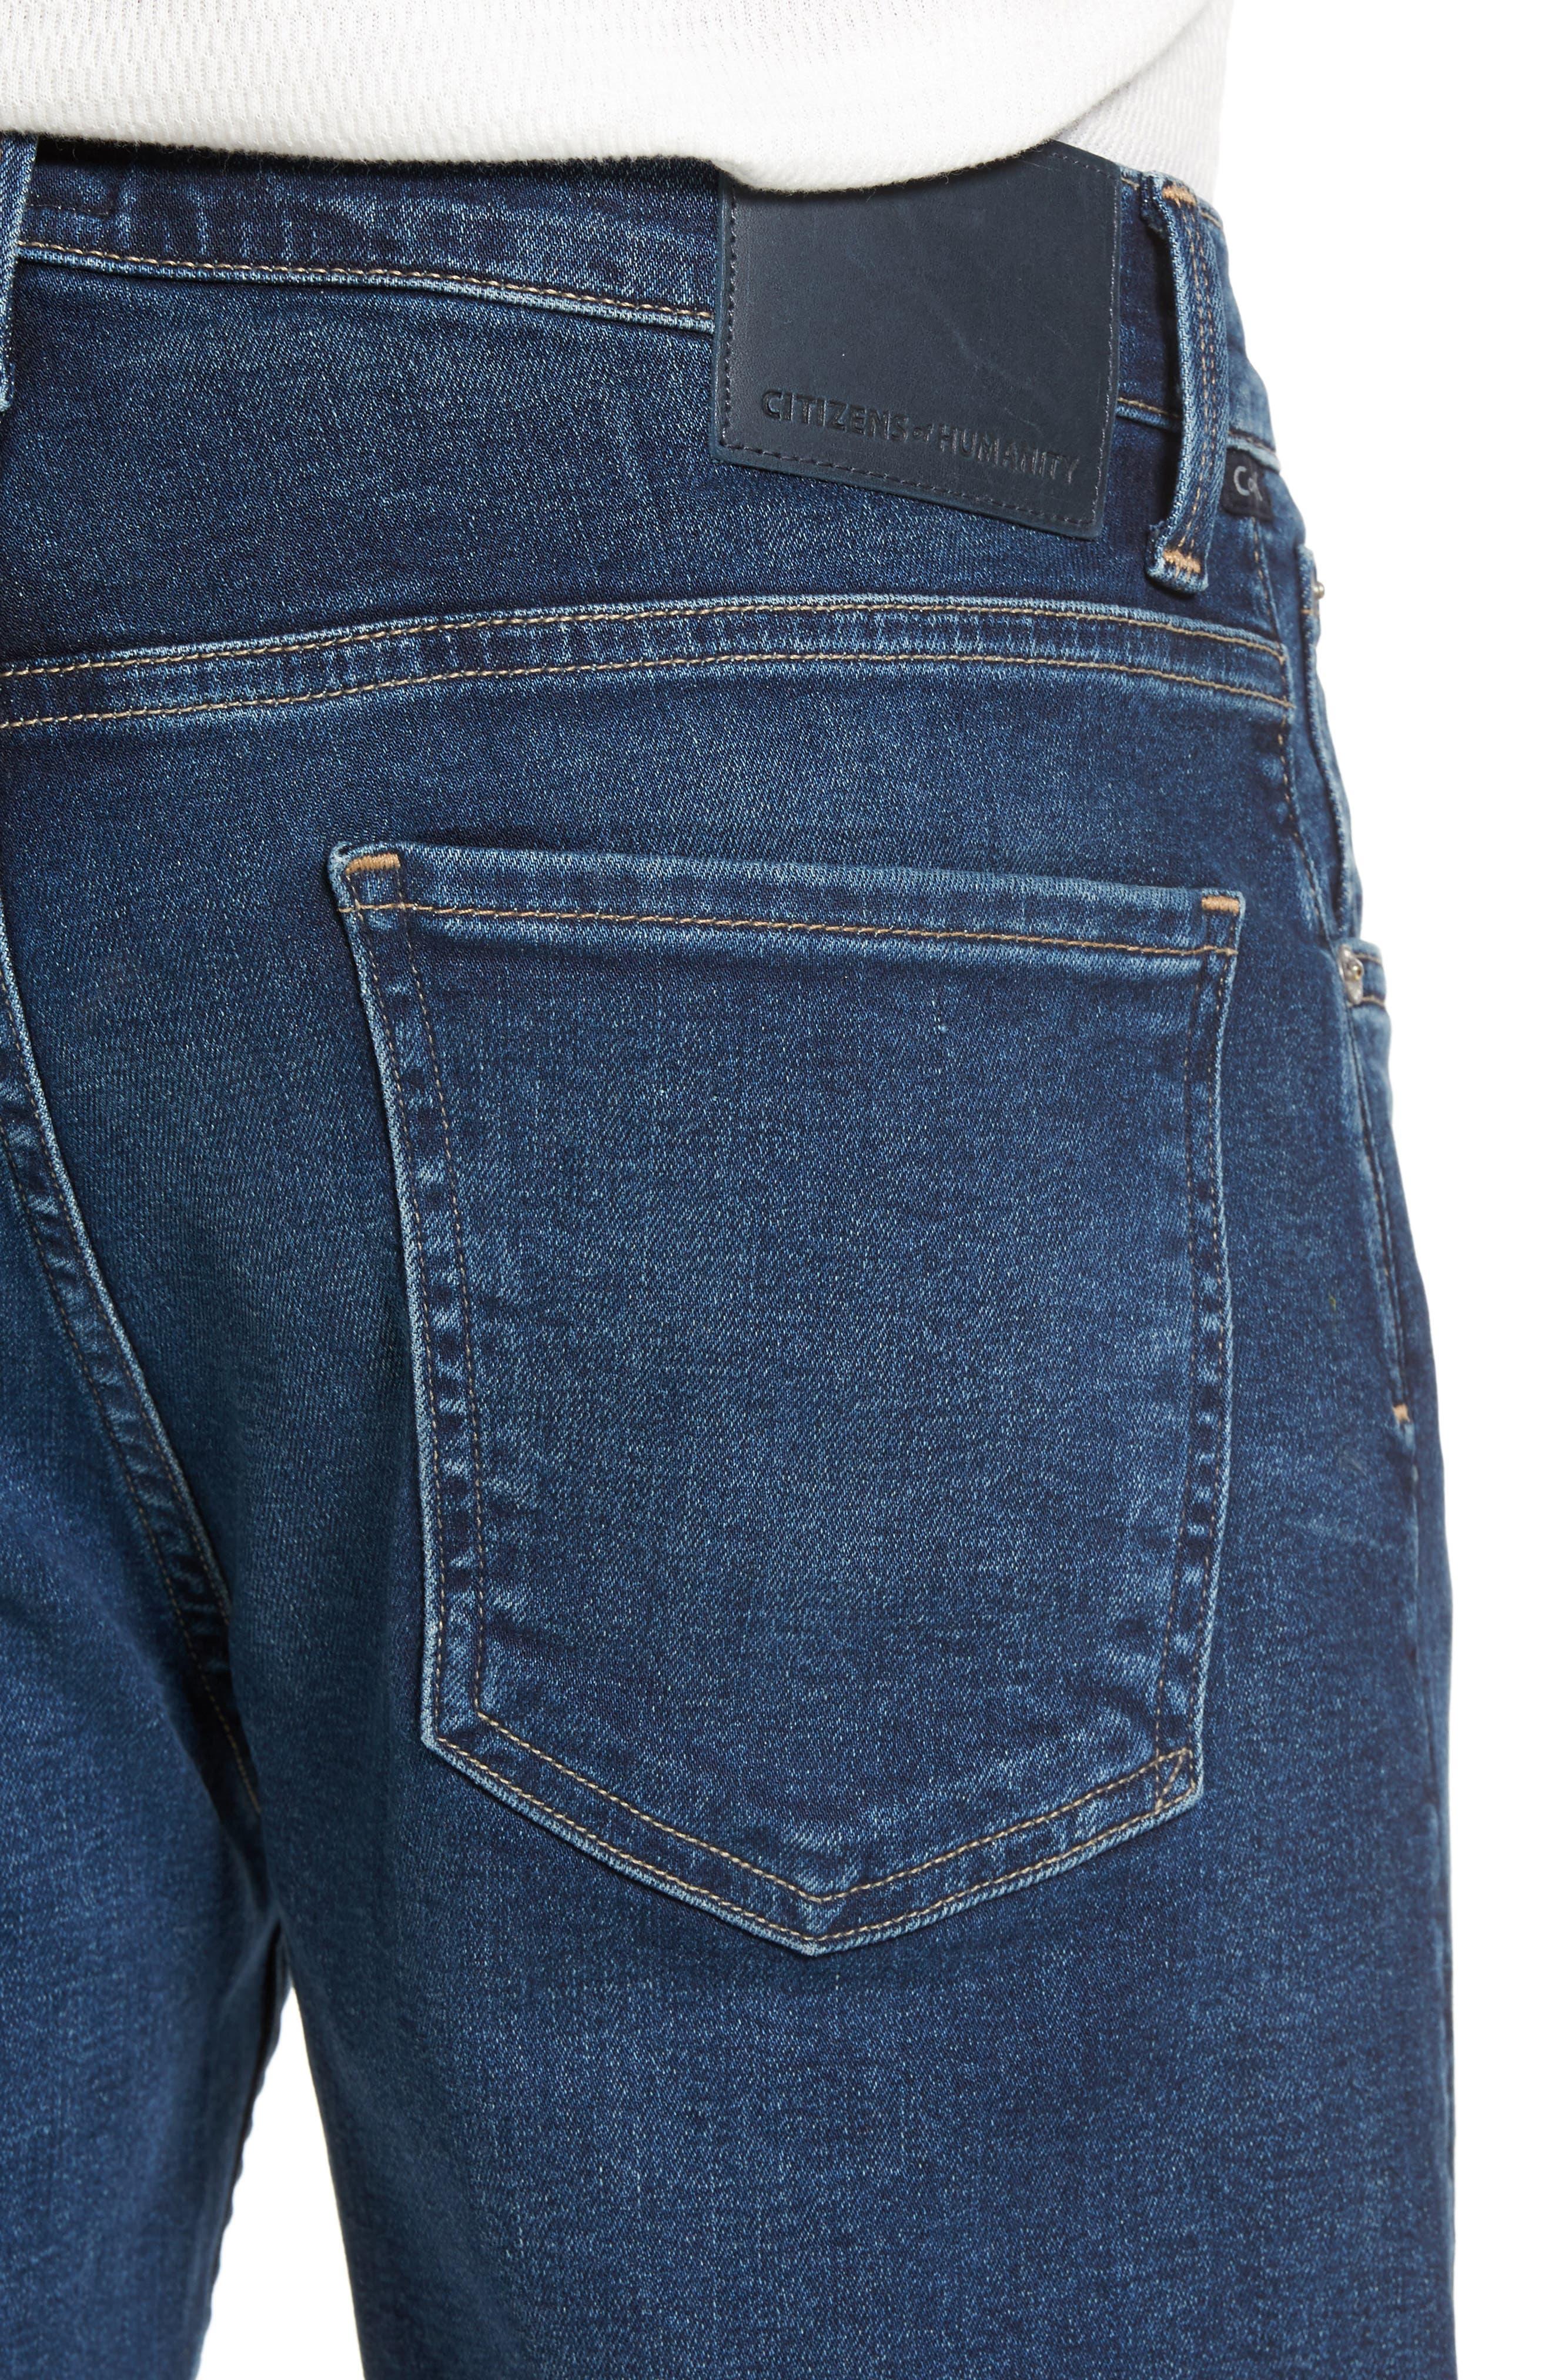 PERFORM - Gage Slim Straight Leg Jeans,                             Alternate thumbnail 4, color,                             Turner